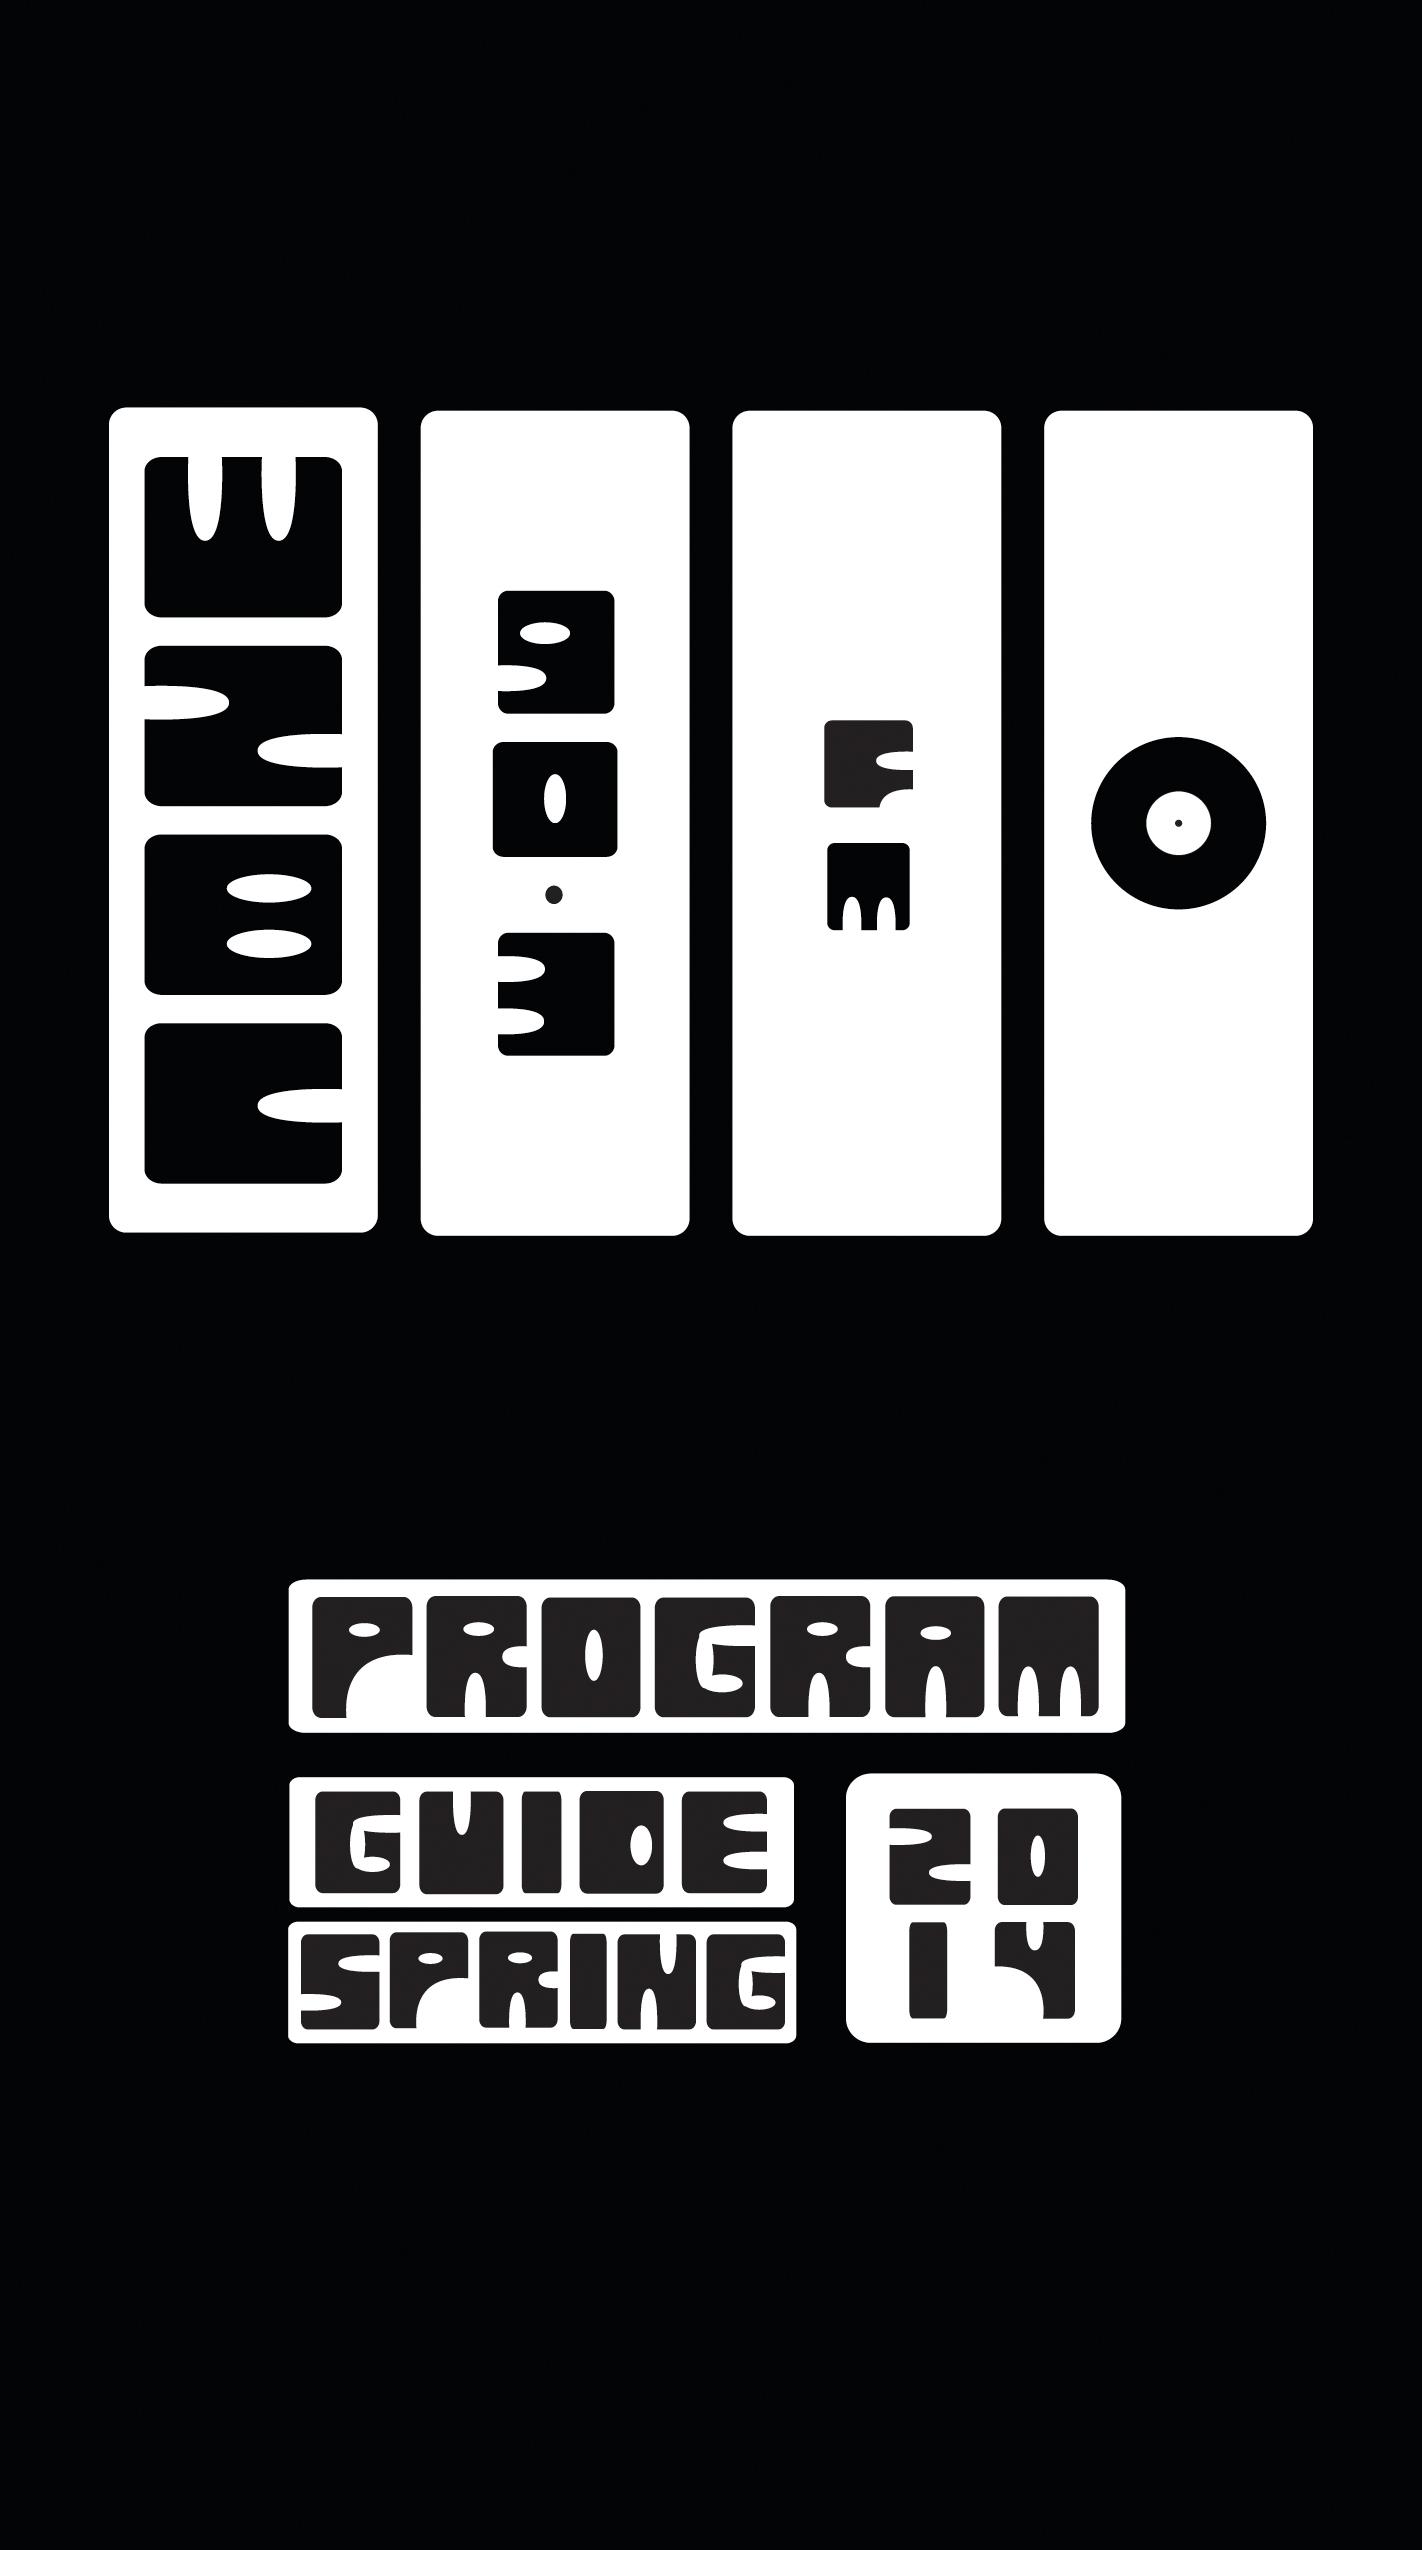 WZBC Program Guide Spring 2014